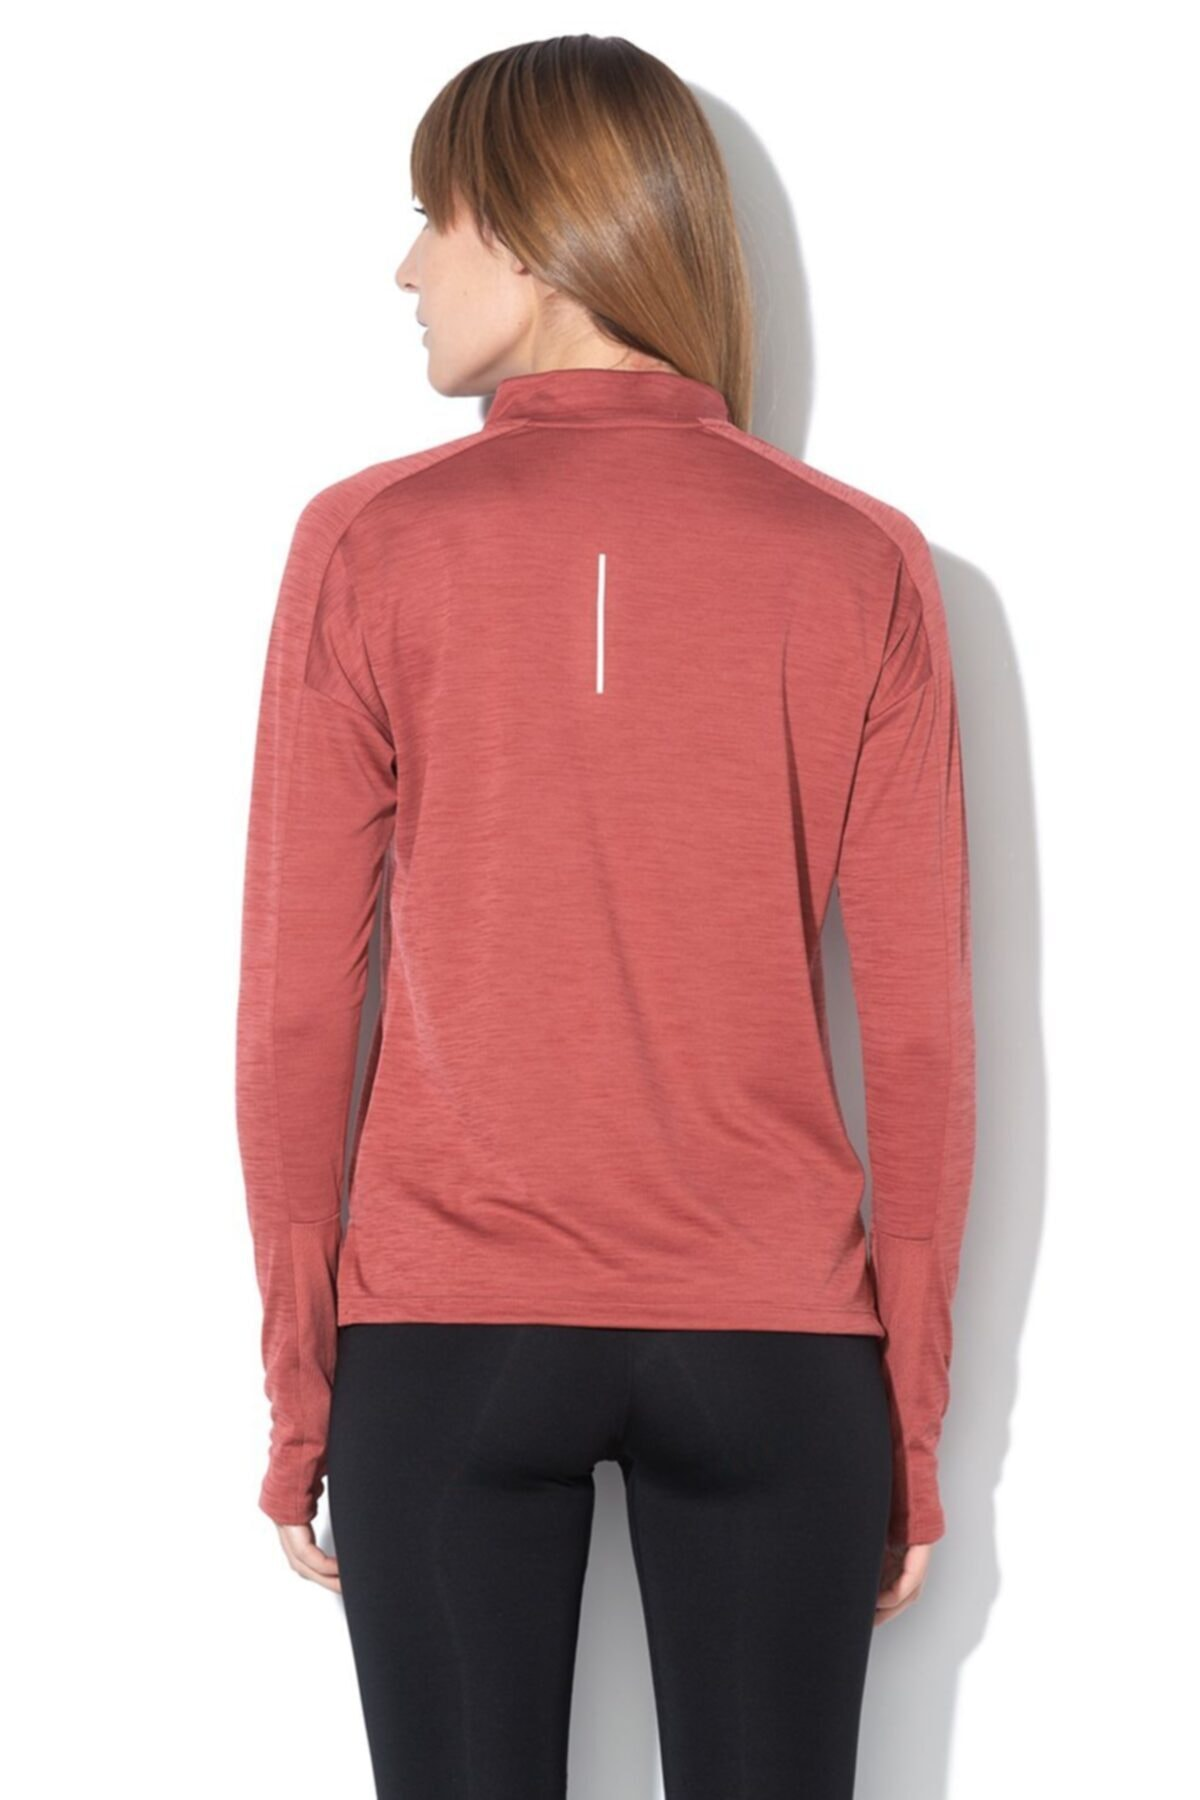 Nike Kadın Kiremit Spor Sweatshirt Nk Pacer Top Hz-928613-661 2